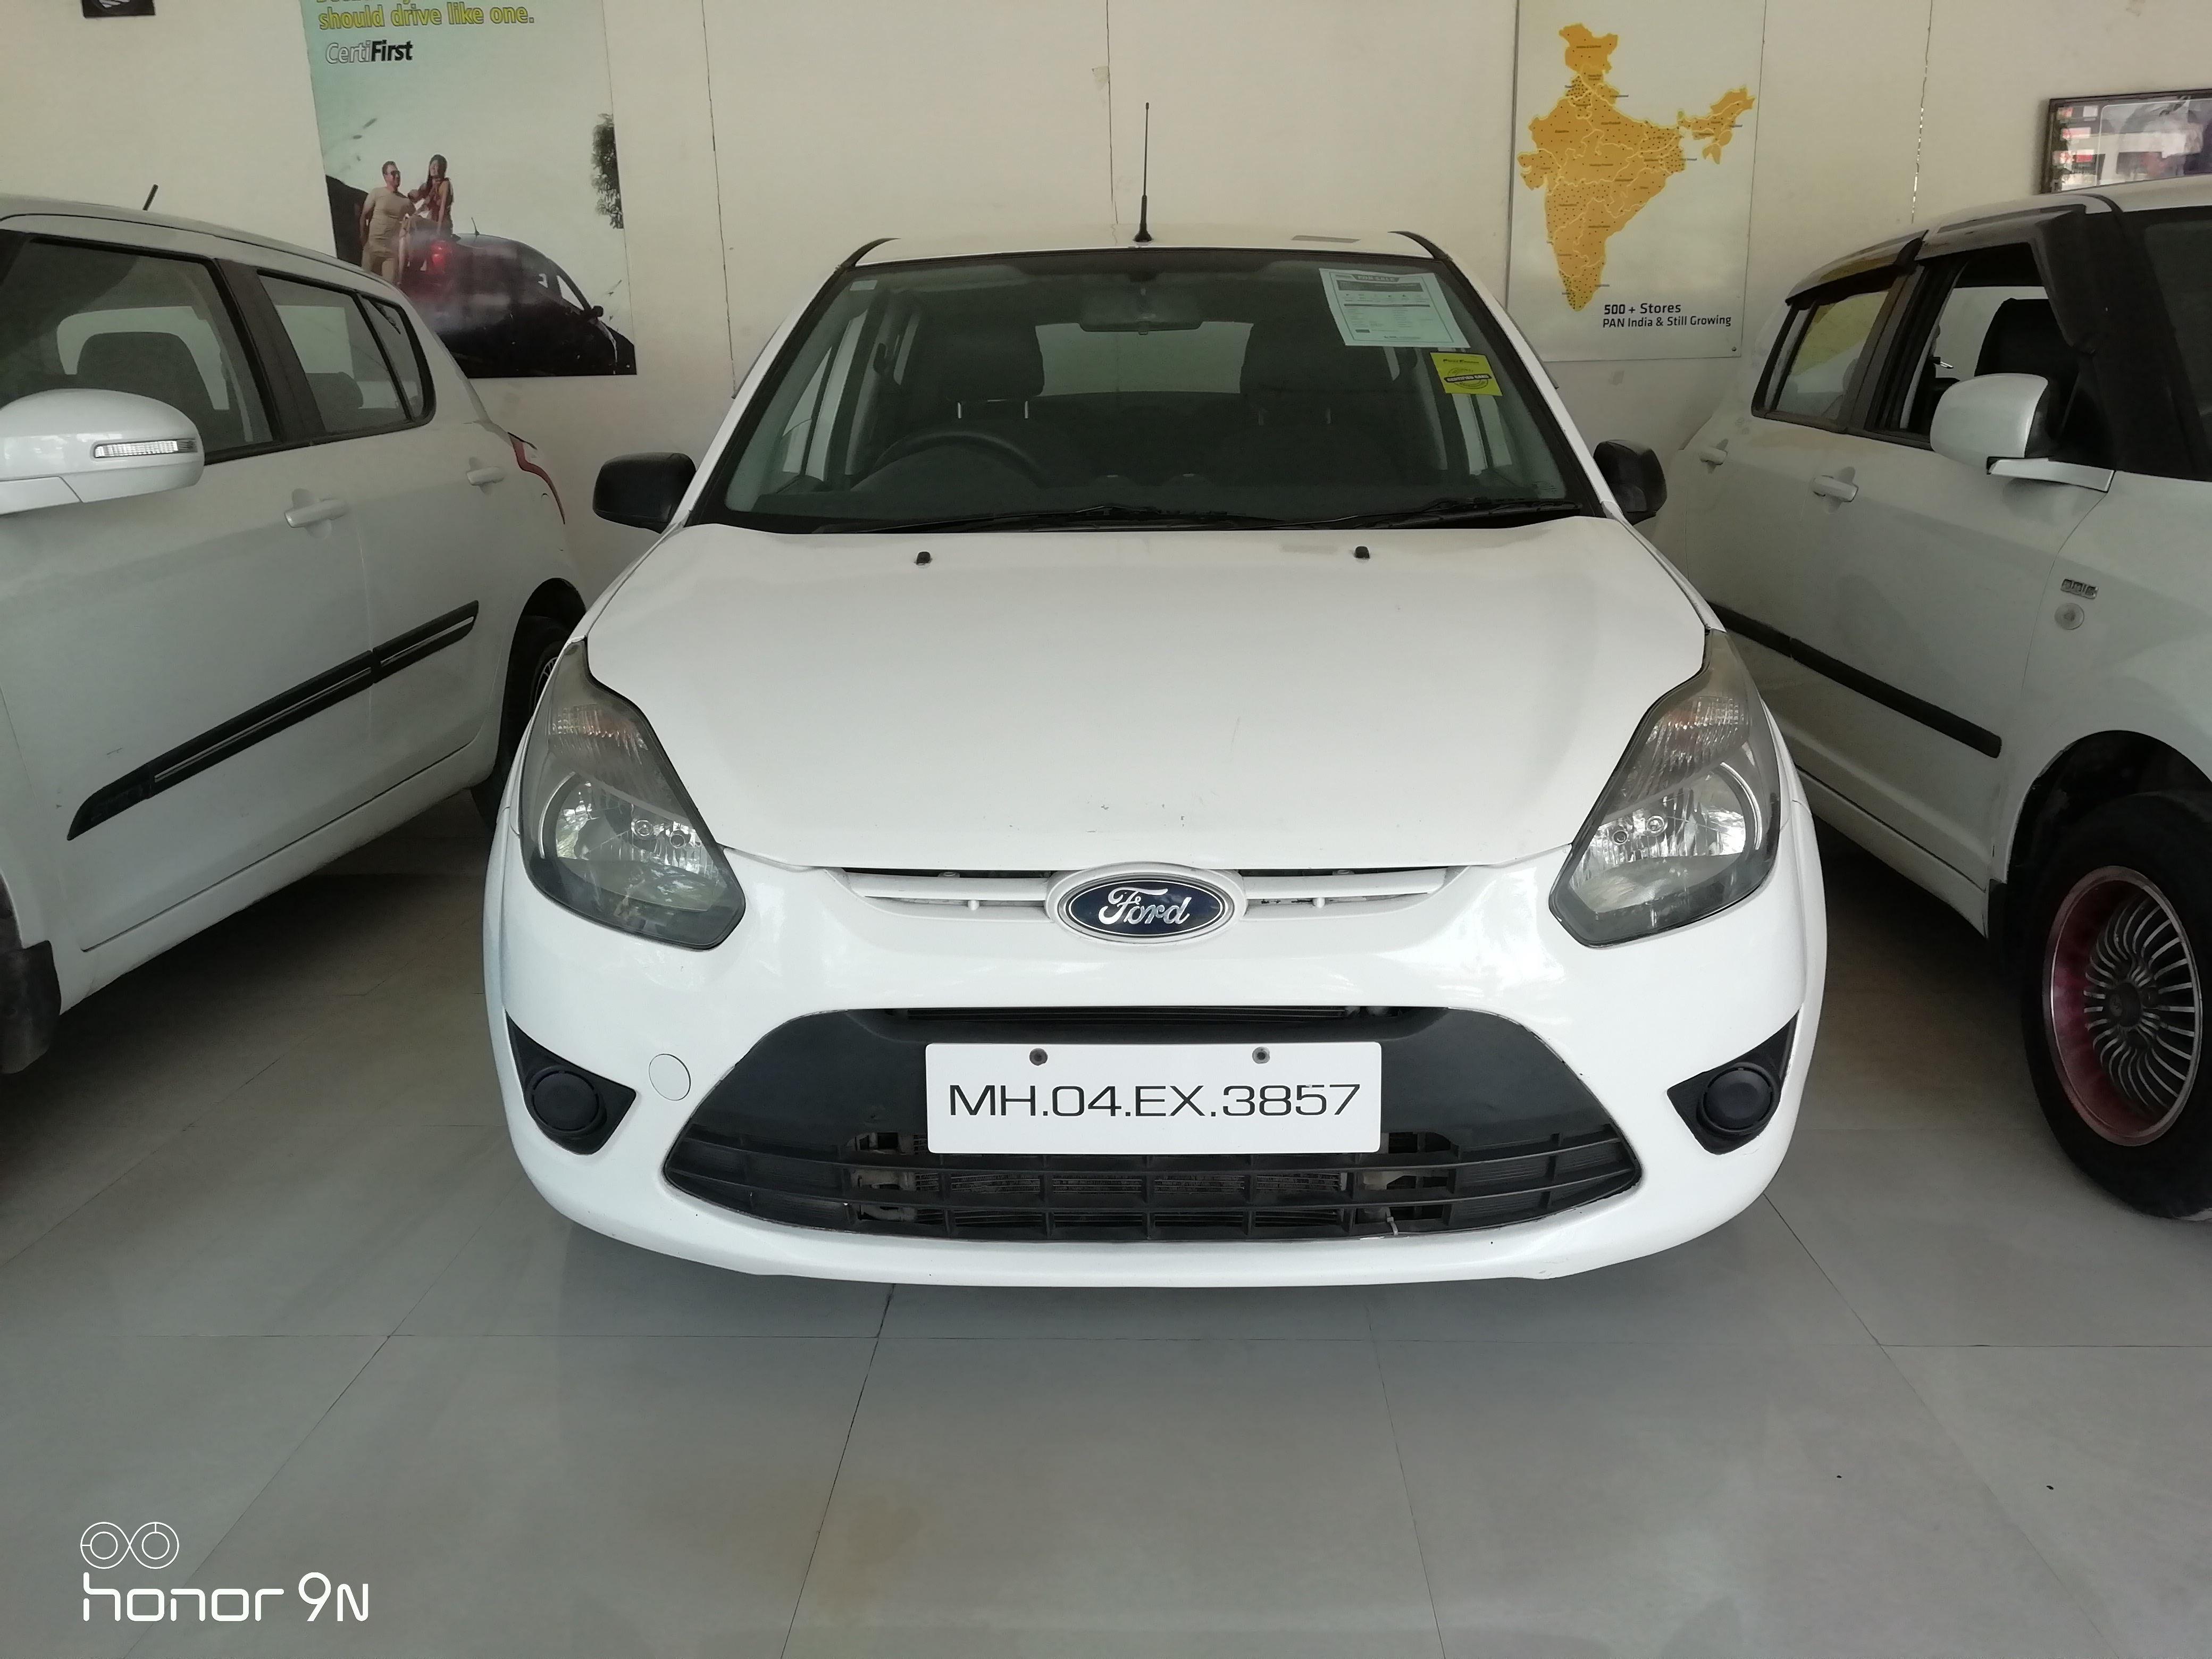 2011 Used Ford Figo EXI DURATORQ 1.4